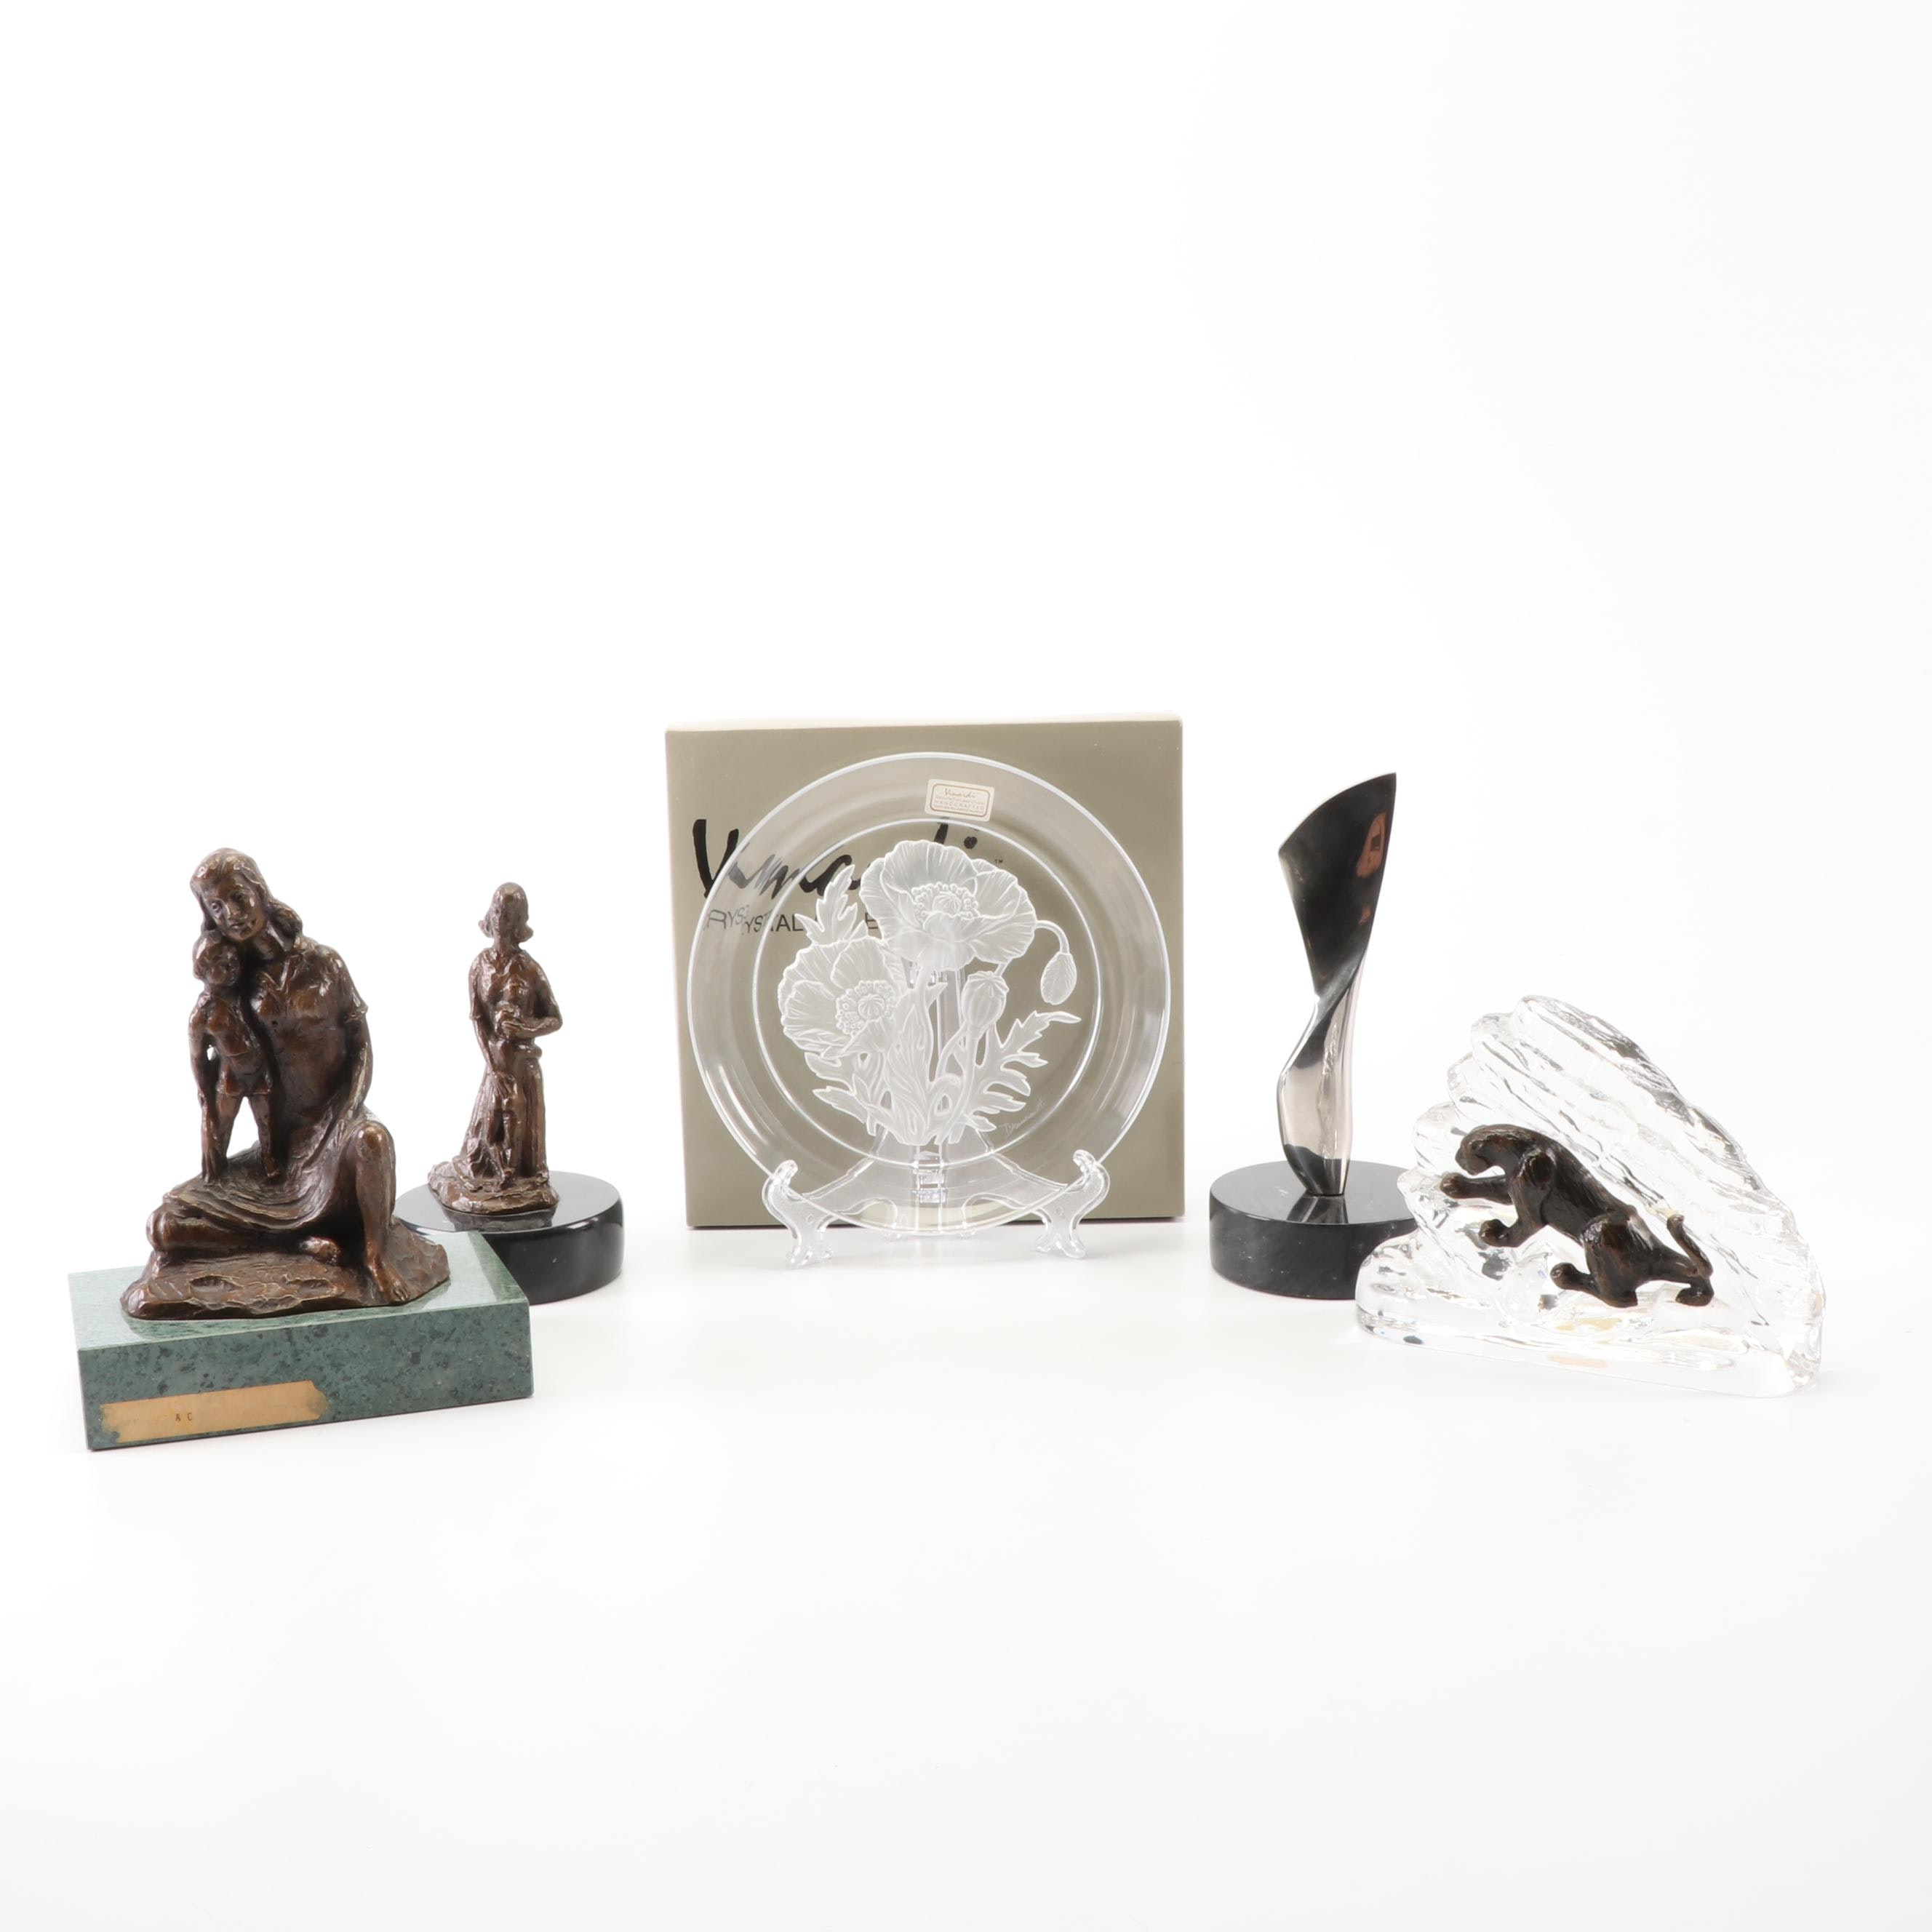 Vinardi Crystal Plate and Sculptures